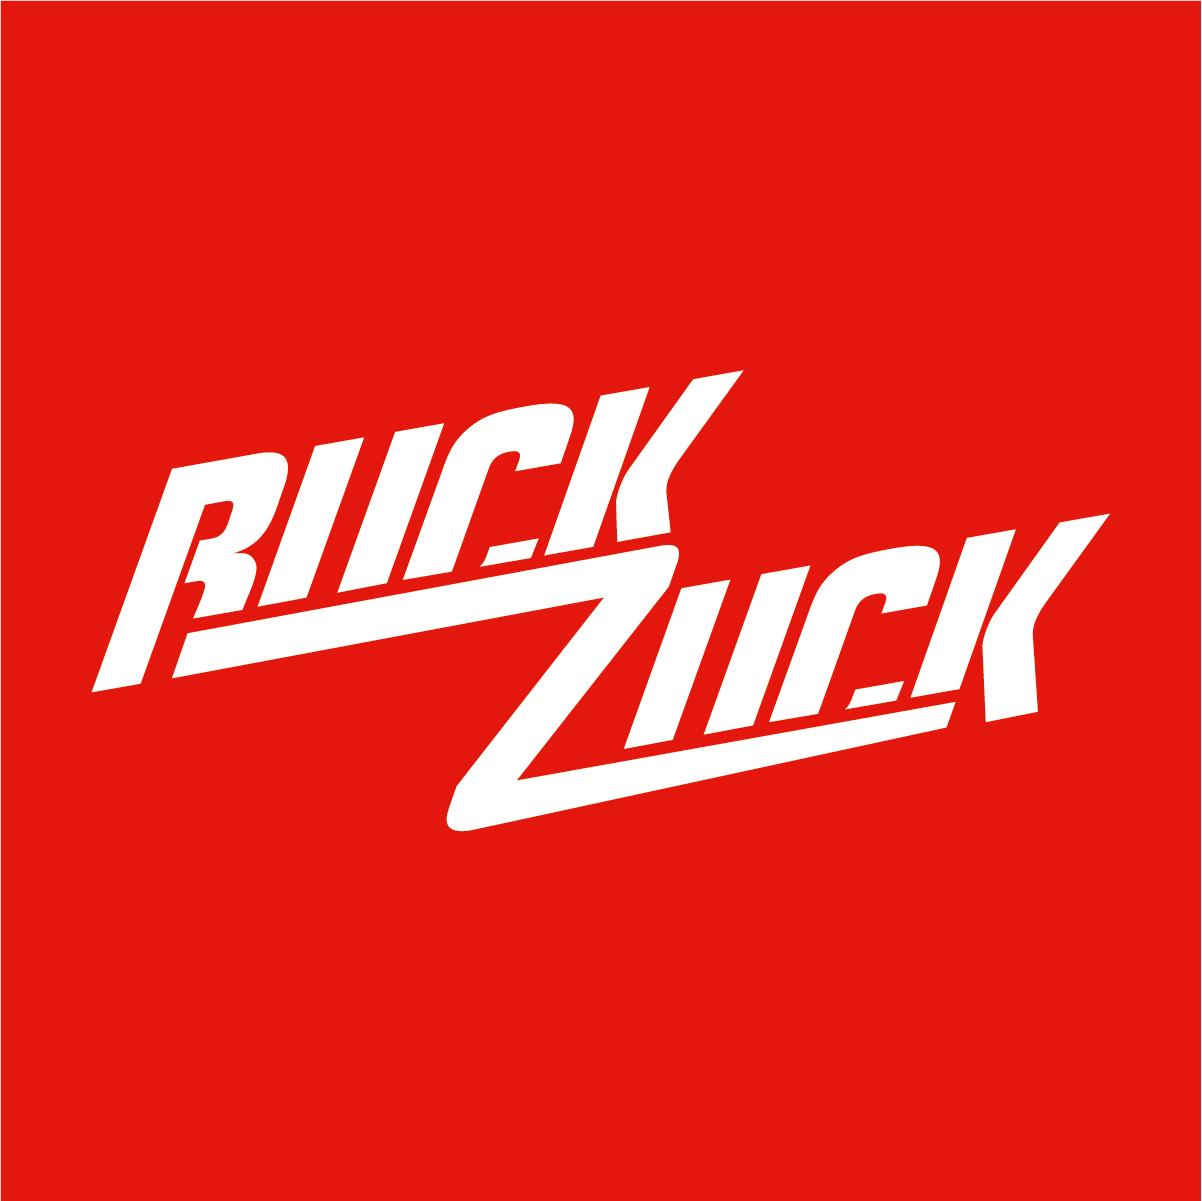 MUSTER CERAMIN VARIO 3mm Fliese x-tra breit Tadelakt grau-braun PVC-frei